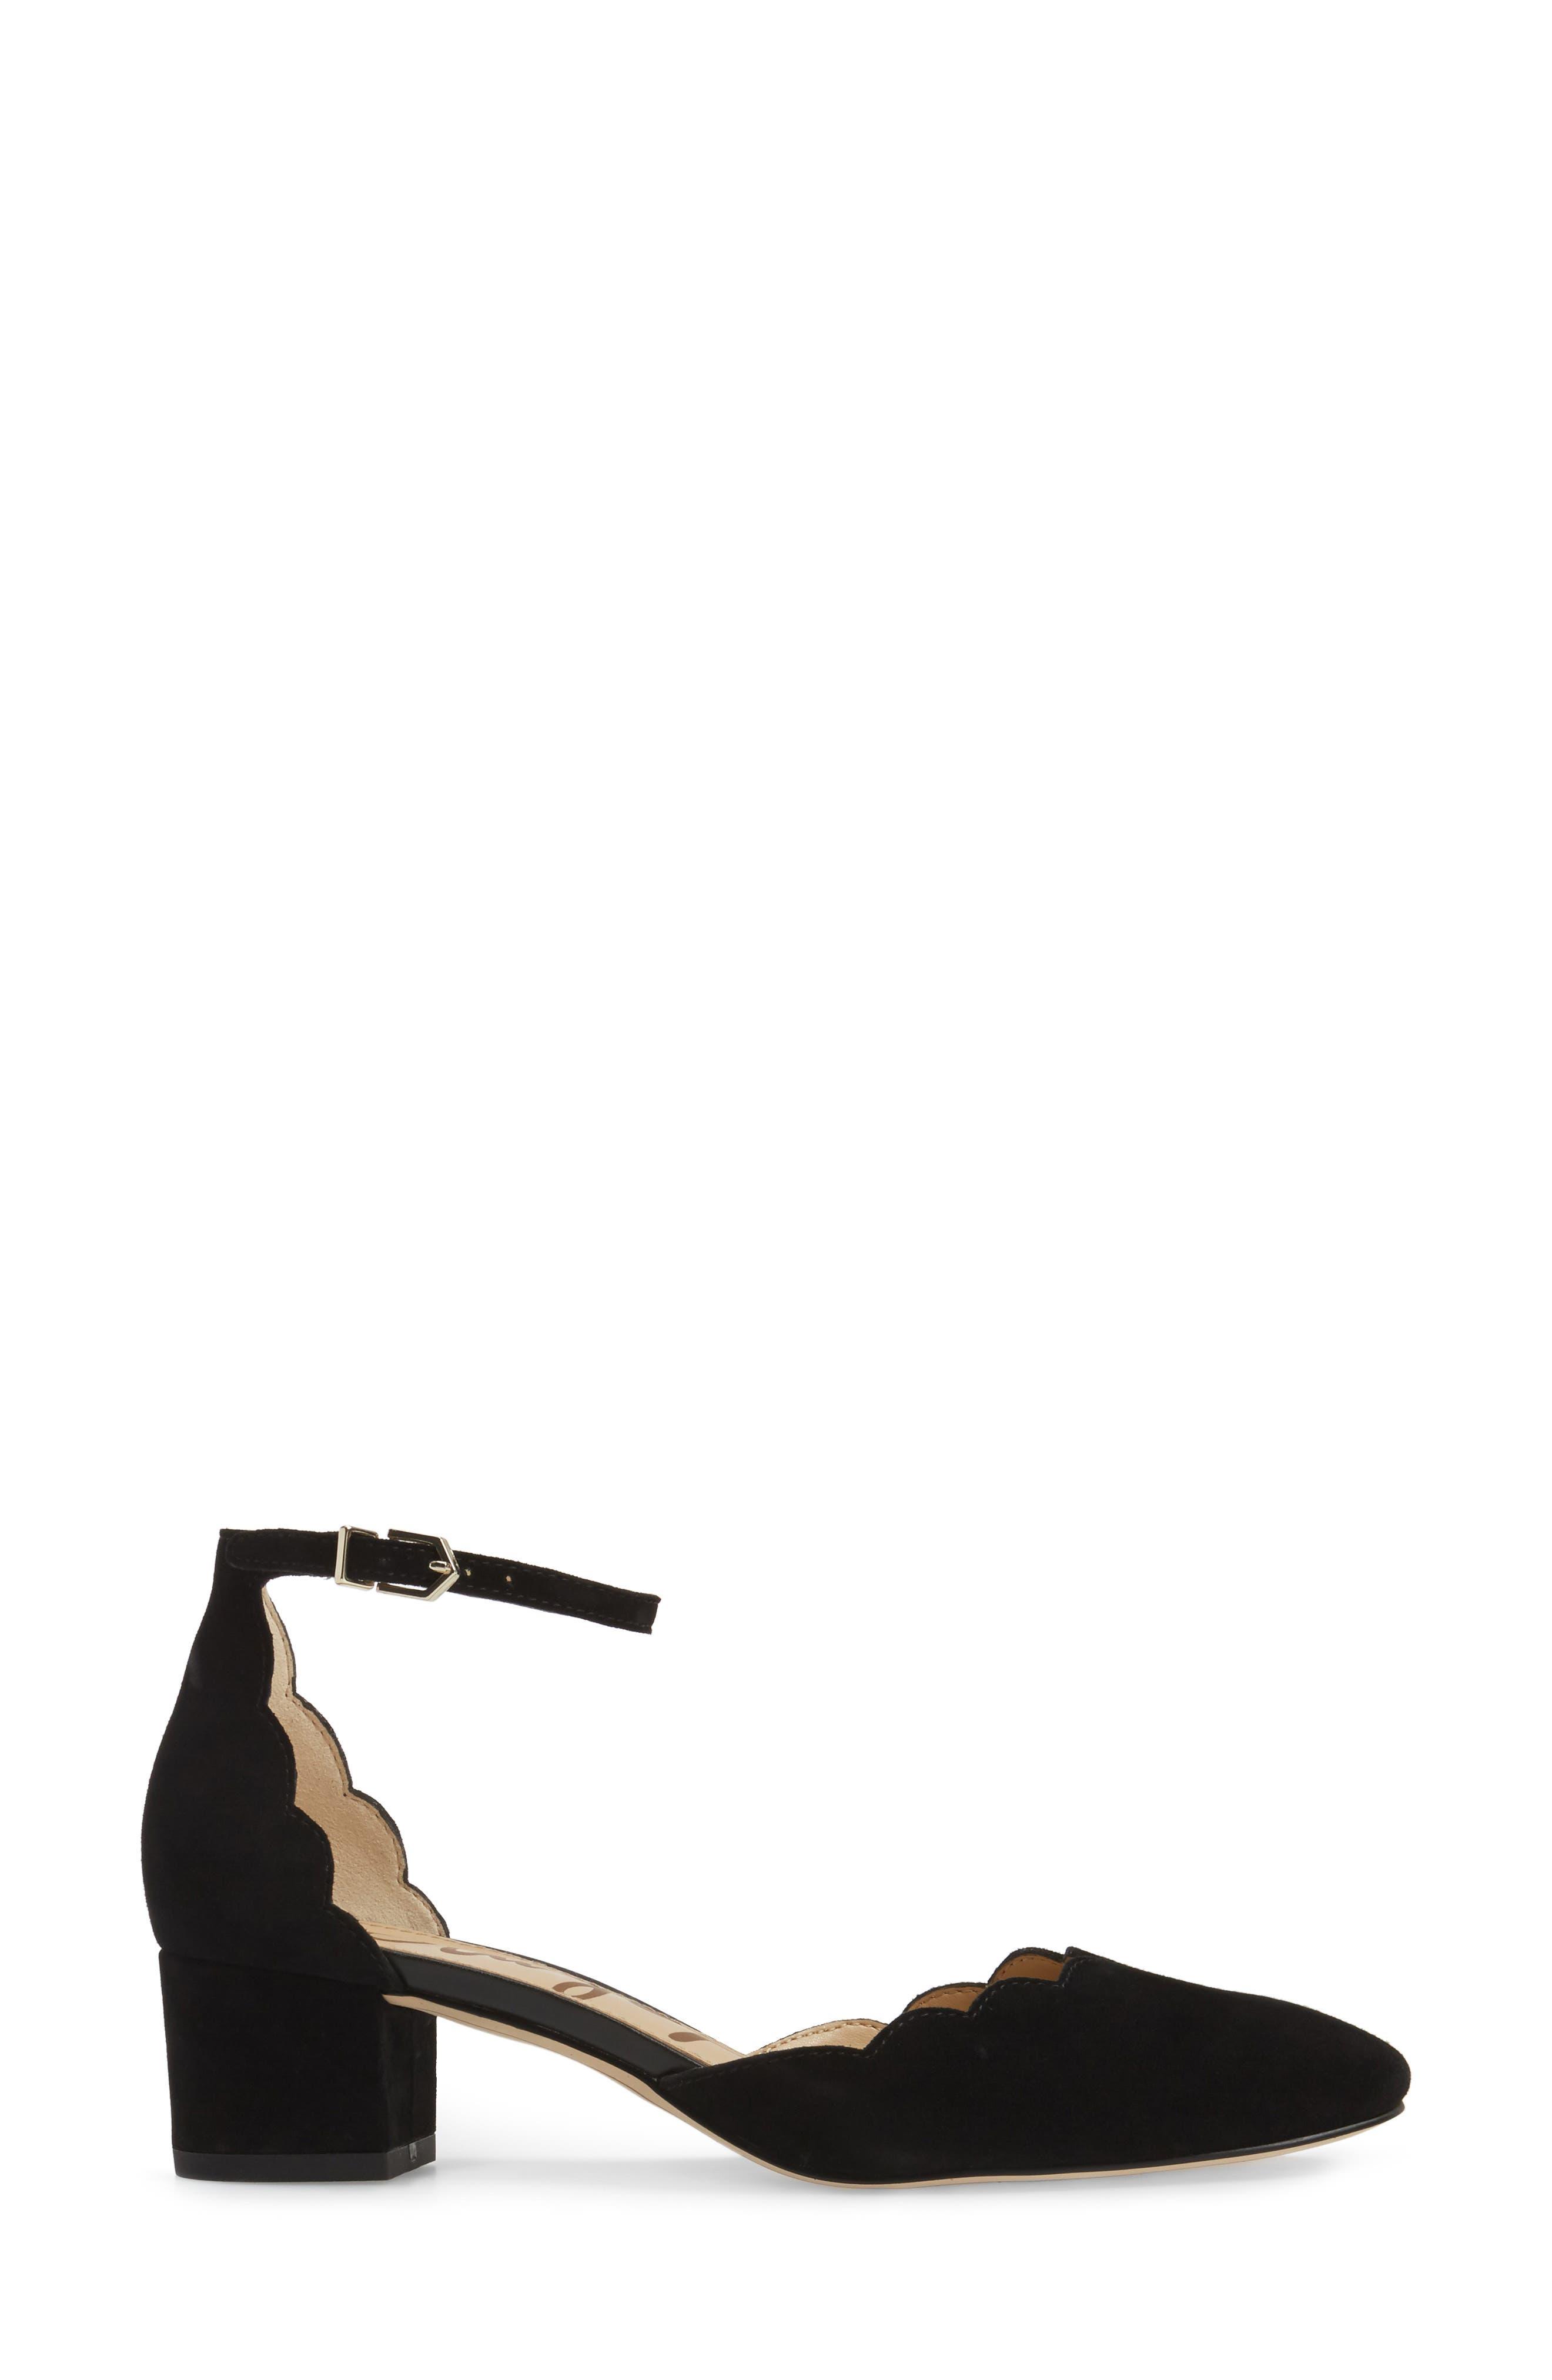 Lara Ankle Strap Pump,                             Alternate thumbnail 3, color,                             001